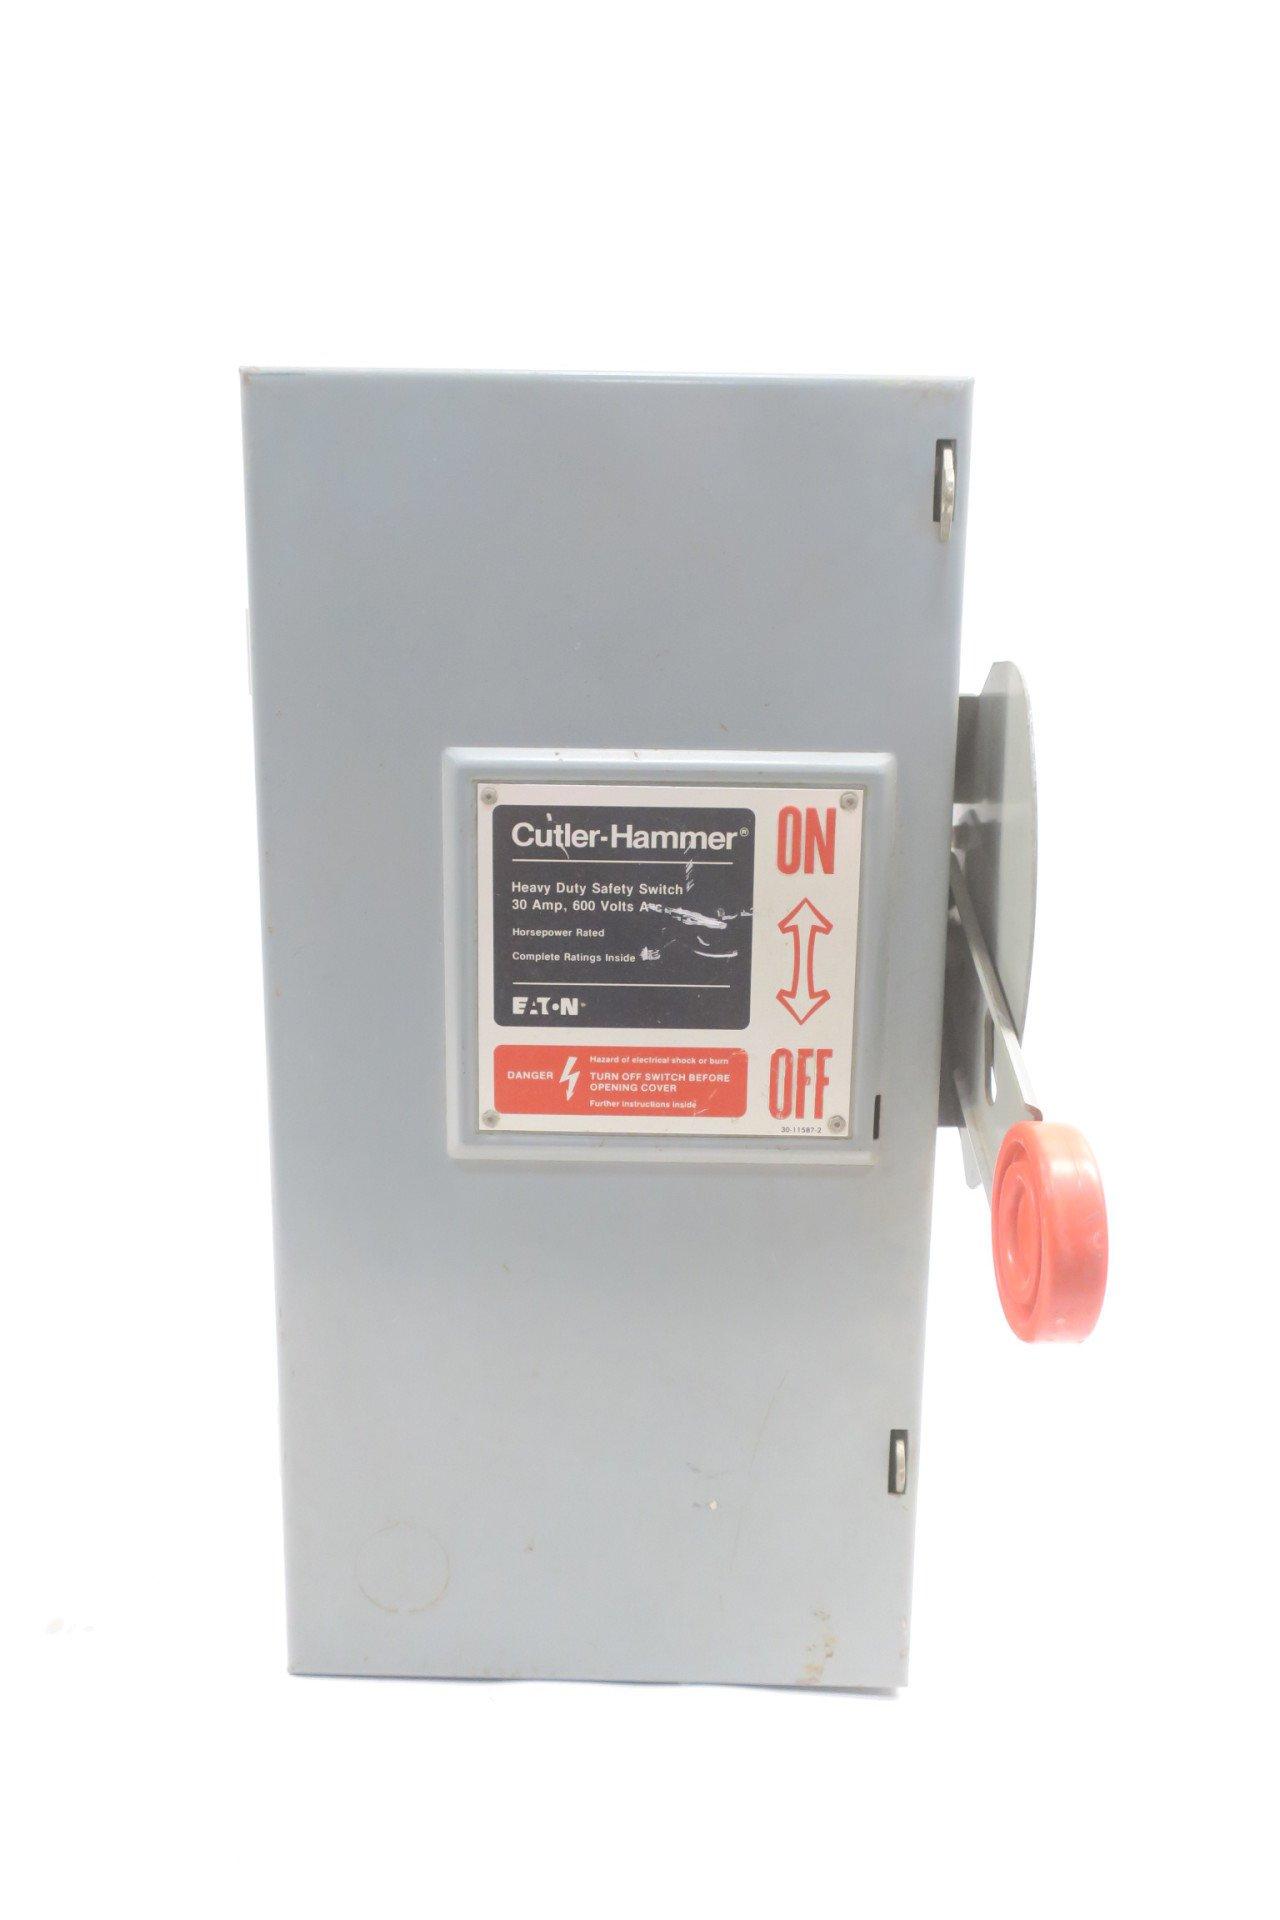 CUTLER HAMMER DH361FGK EATON HEAVY DUTY SAFETY SWITCH 30A 600V-AC D582771